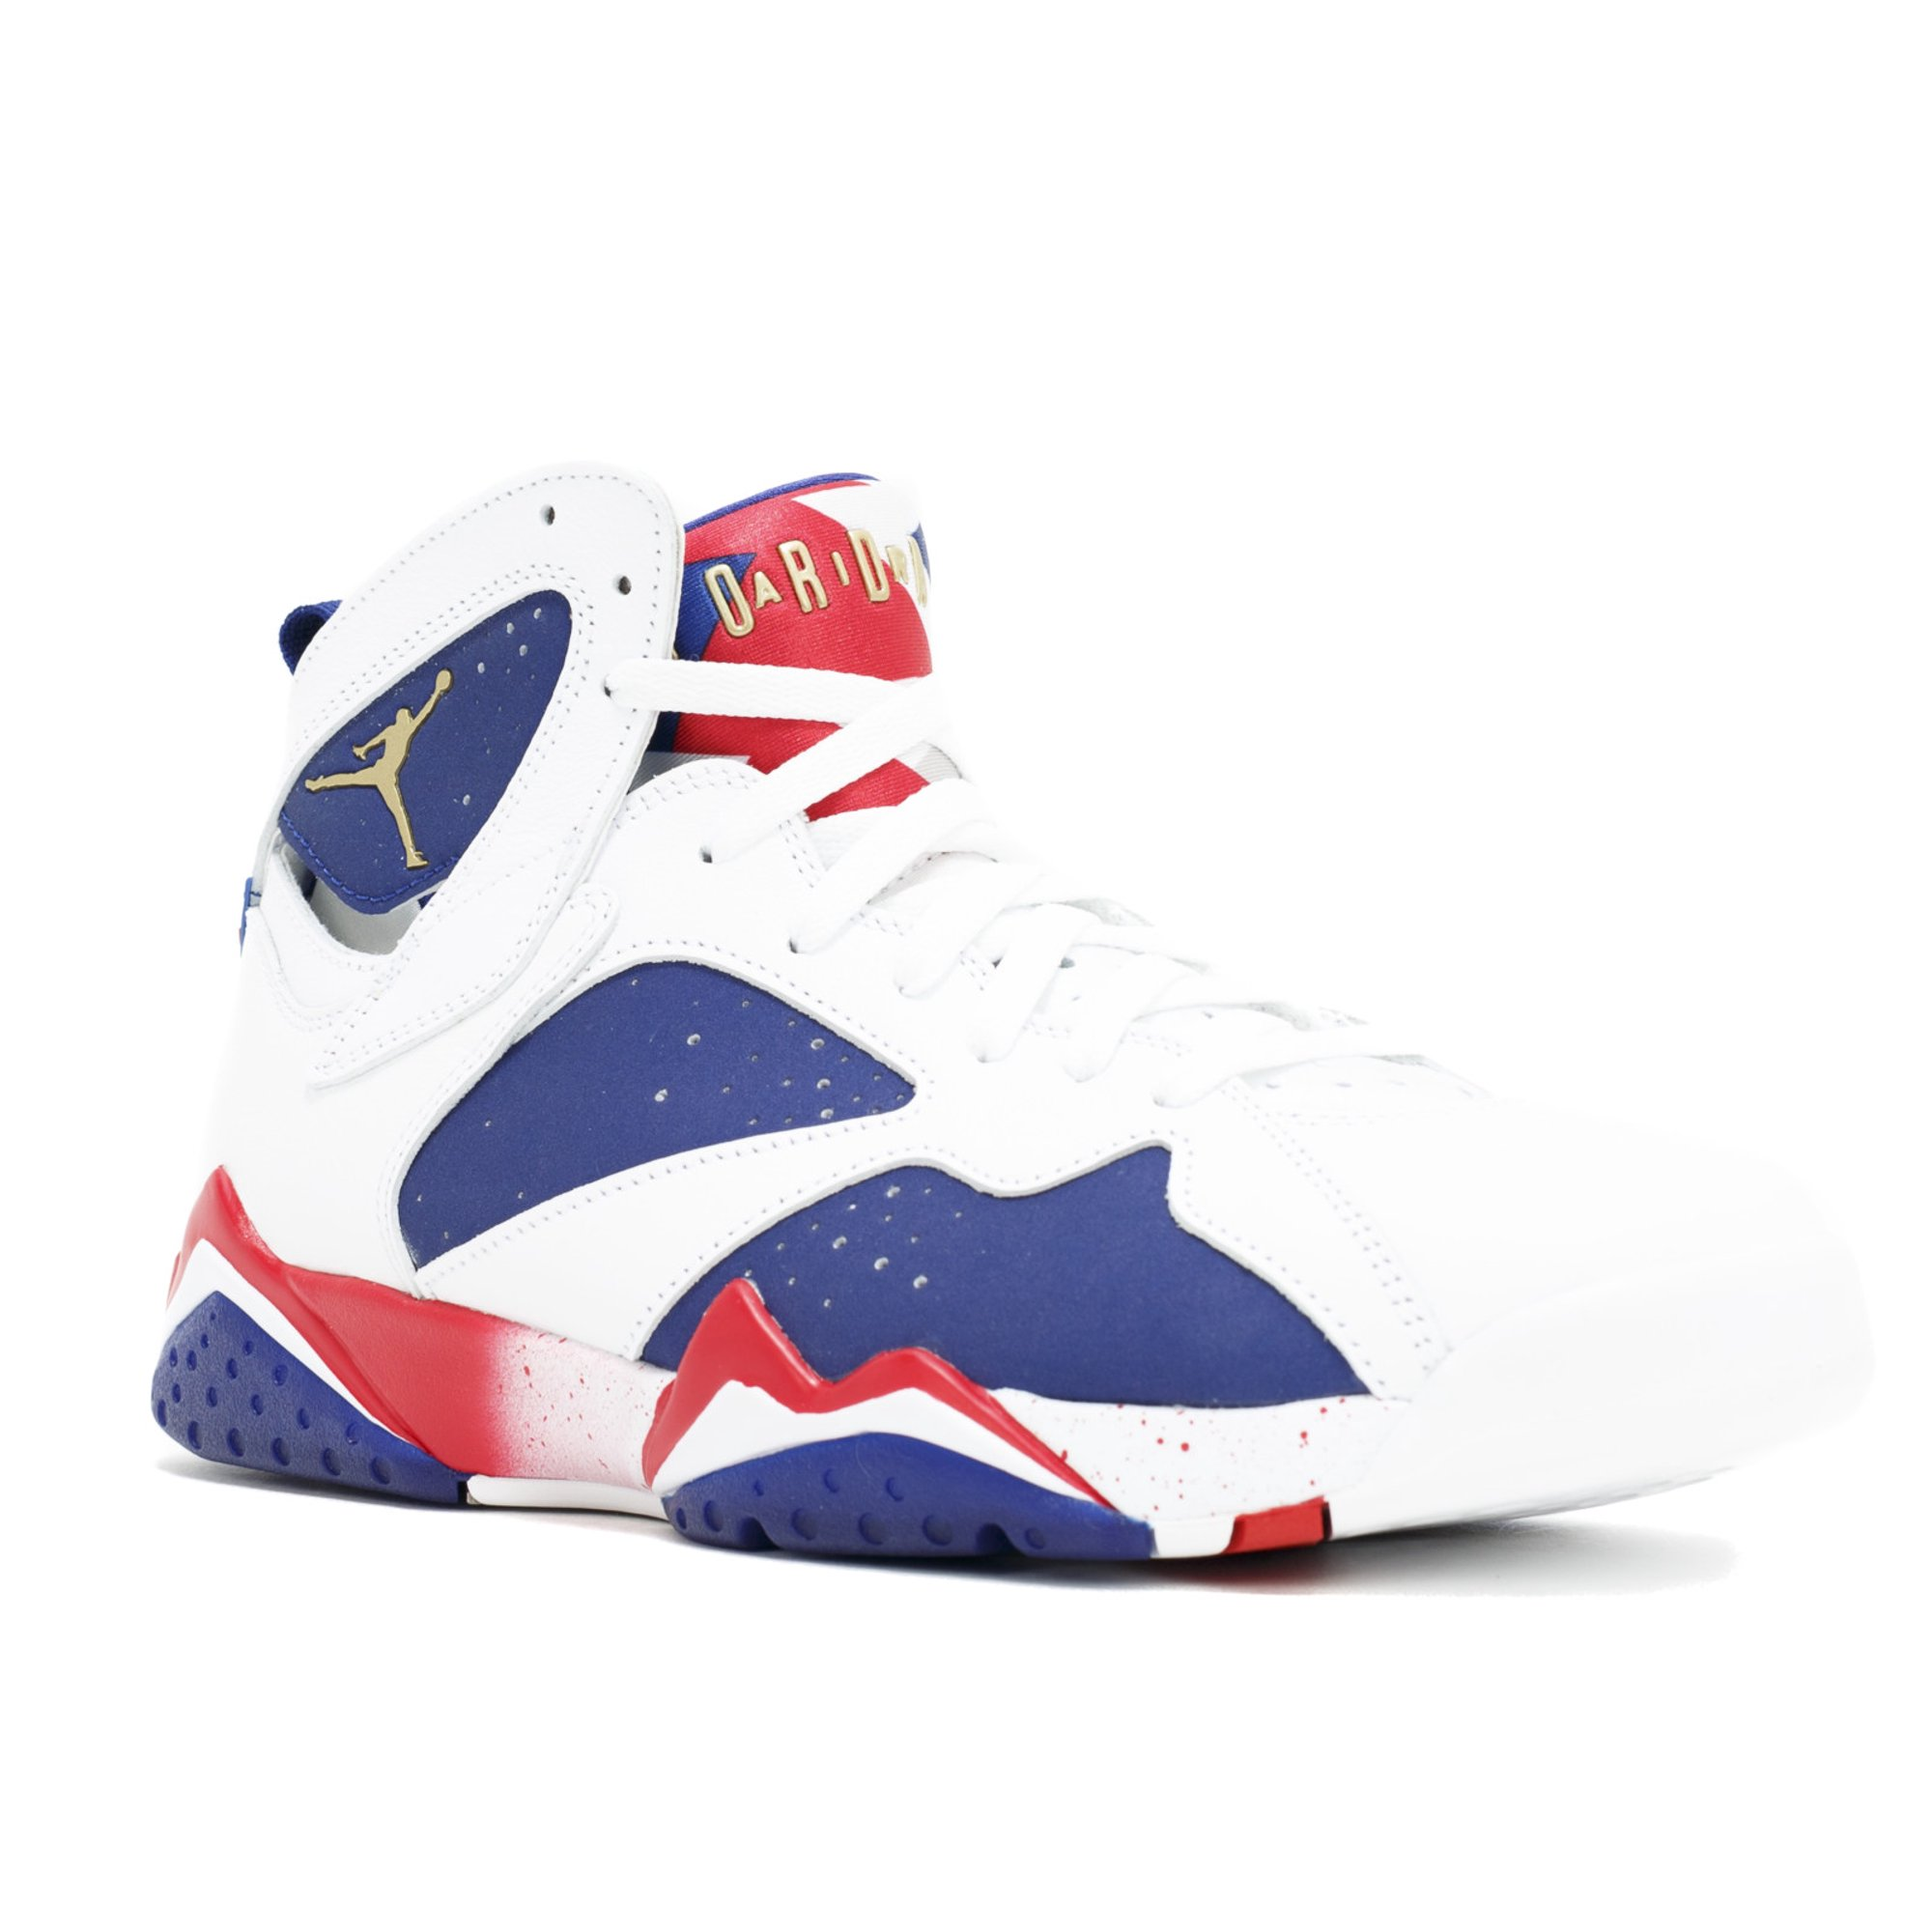 purchase cheap 72ba8 7de22 Air Jordan - Men - Air Jordan 7 Retro  Tinker Alternate Olympic  -  304775-123 - Size 13.5   Walmart Canada